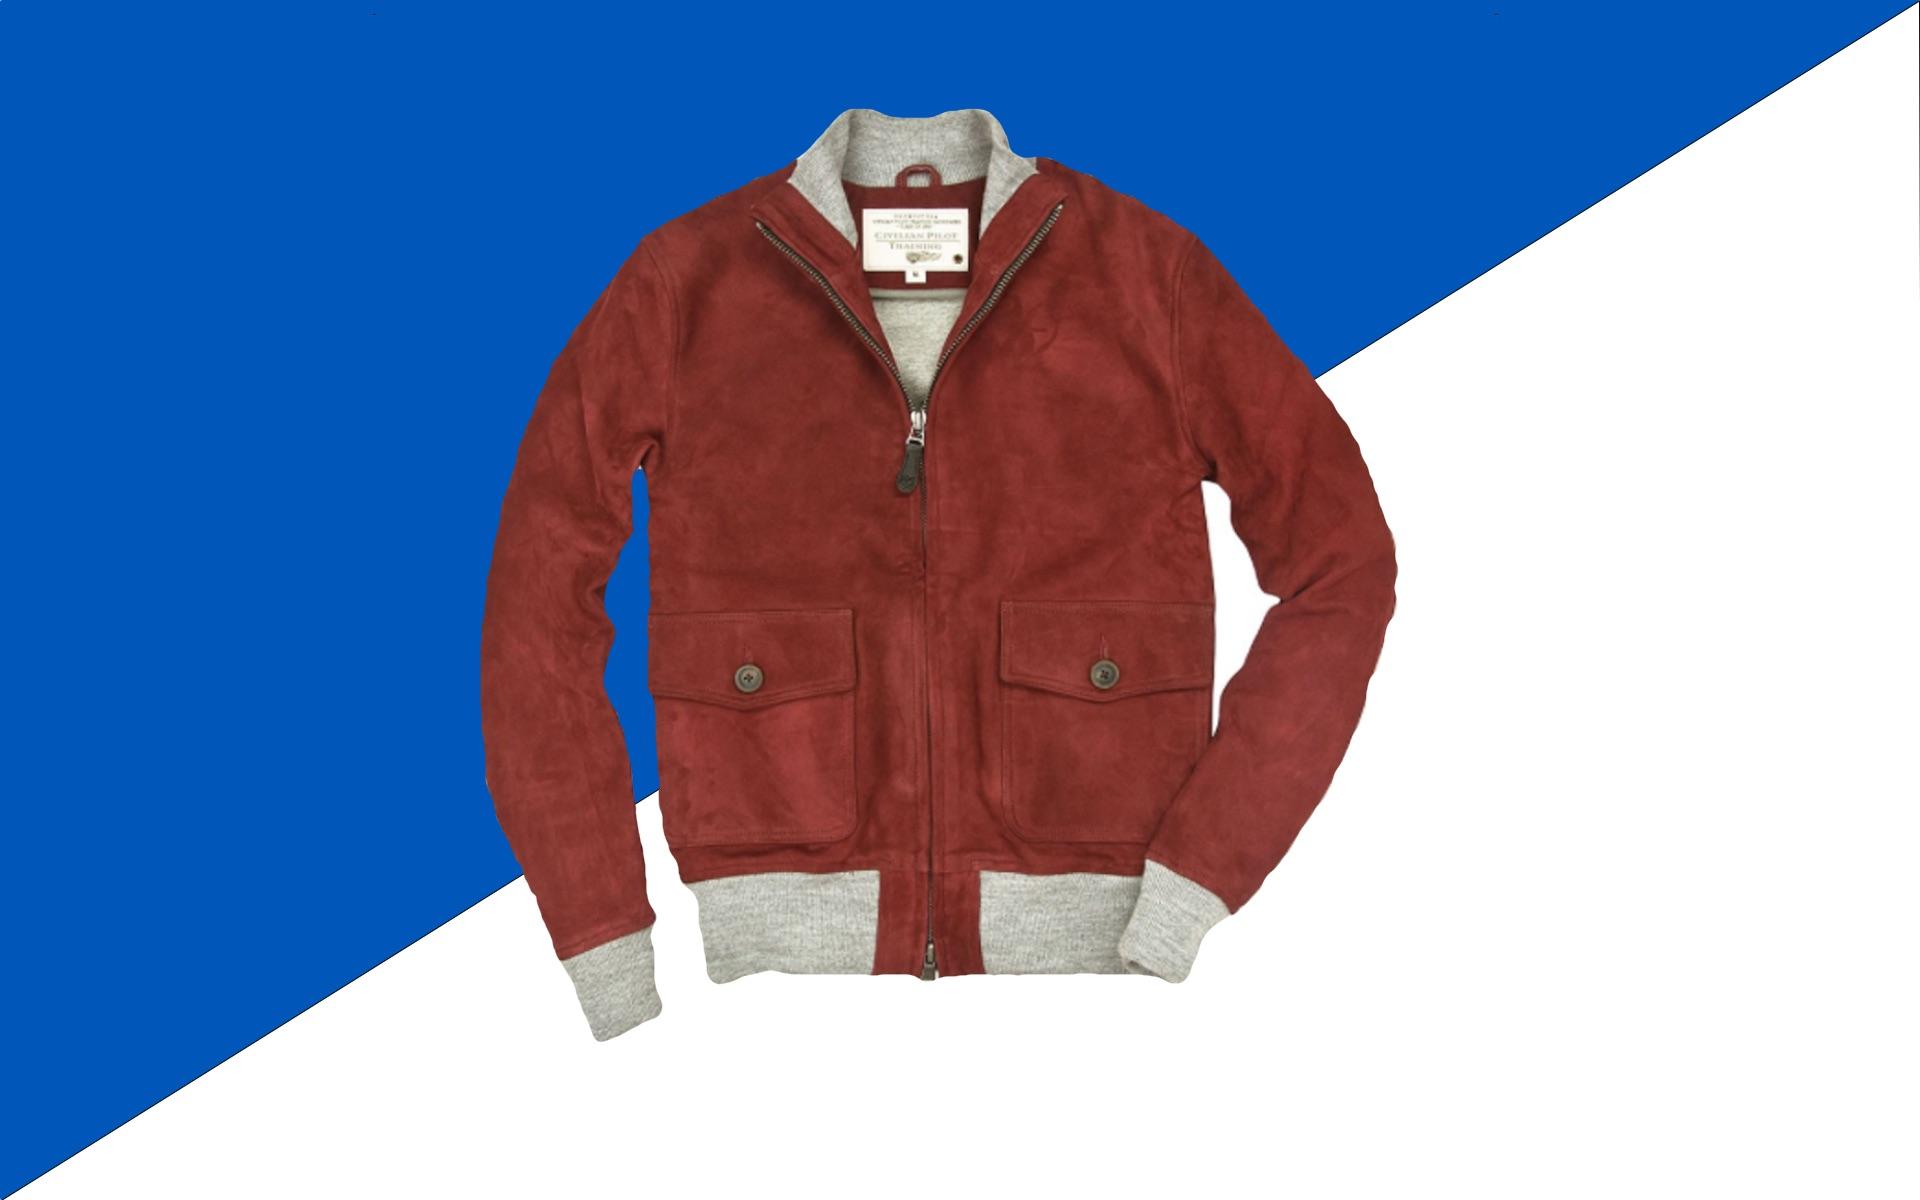 b833a3eb3cc24 Best Bomber Jackets Under $500 – Men's Style Pro | Men's Style Blog ...